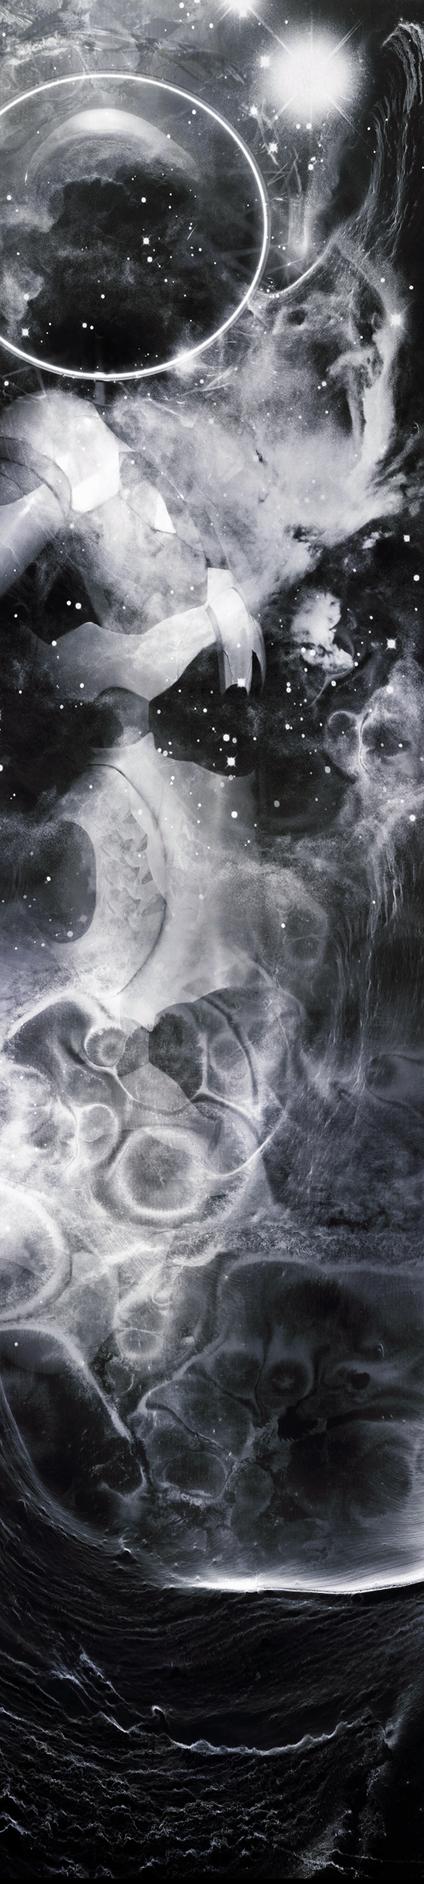 The Astronaut by TALONABRAXAS